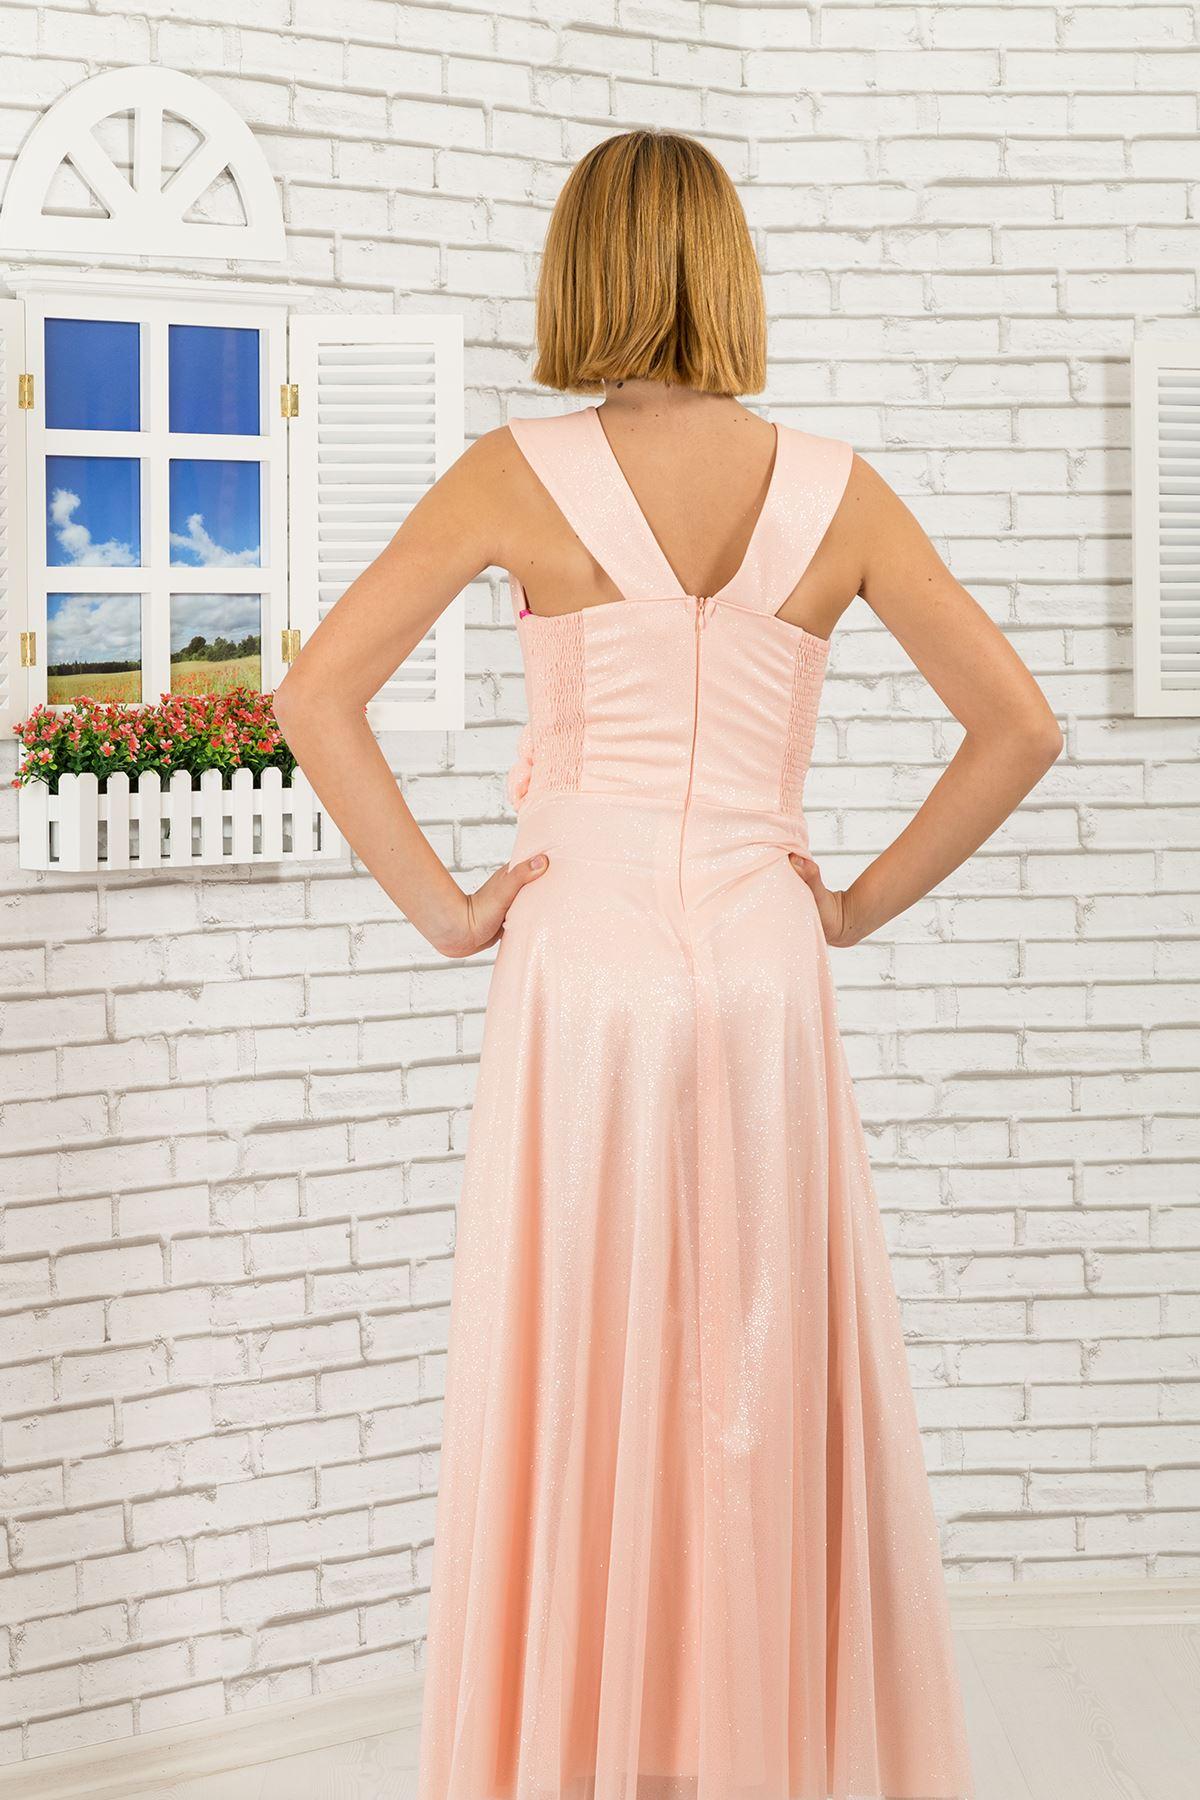 Silvery chiffon fabric, v-neck detailed Girl Evening Dress 470 Salmon